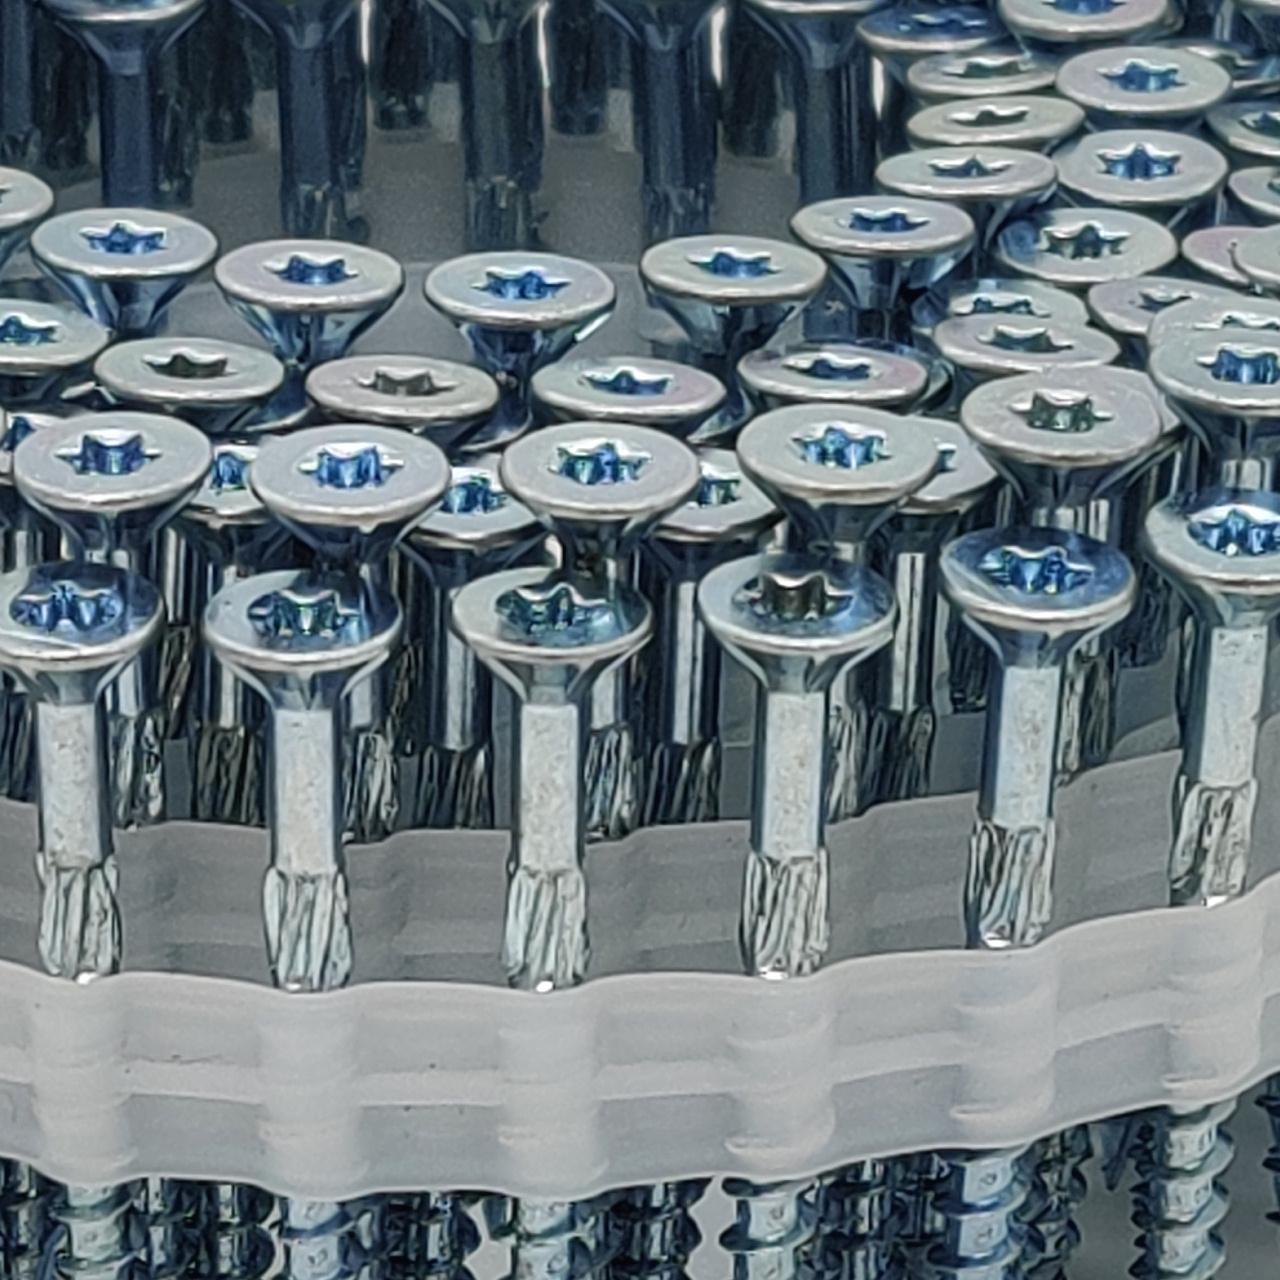 Coil adunox-SuperUni Holzschrauben / Spanplattenschrauben   hell verzinkt   ETA   5,0x80